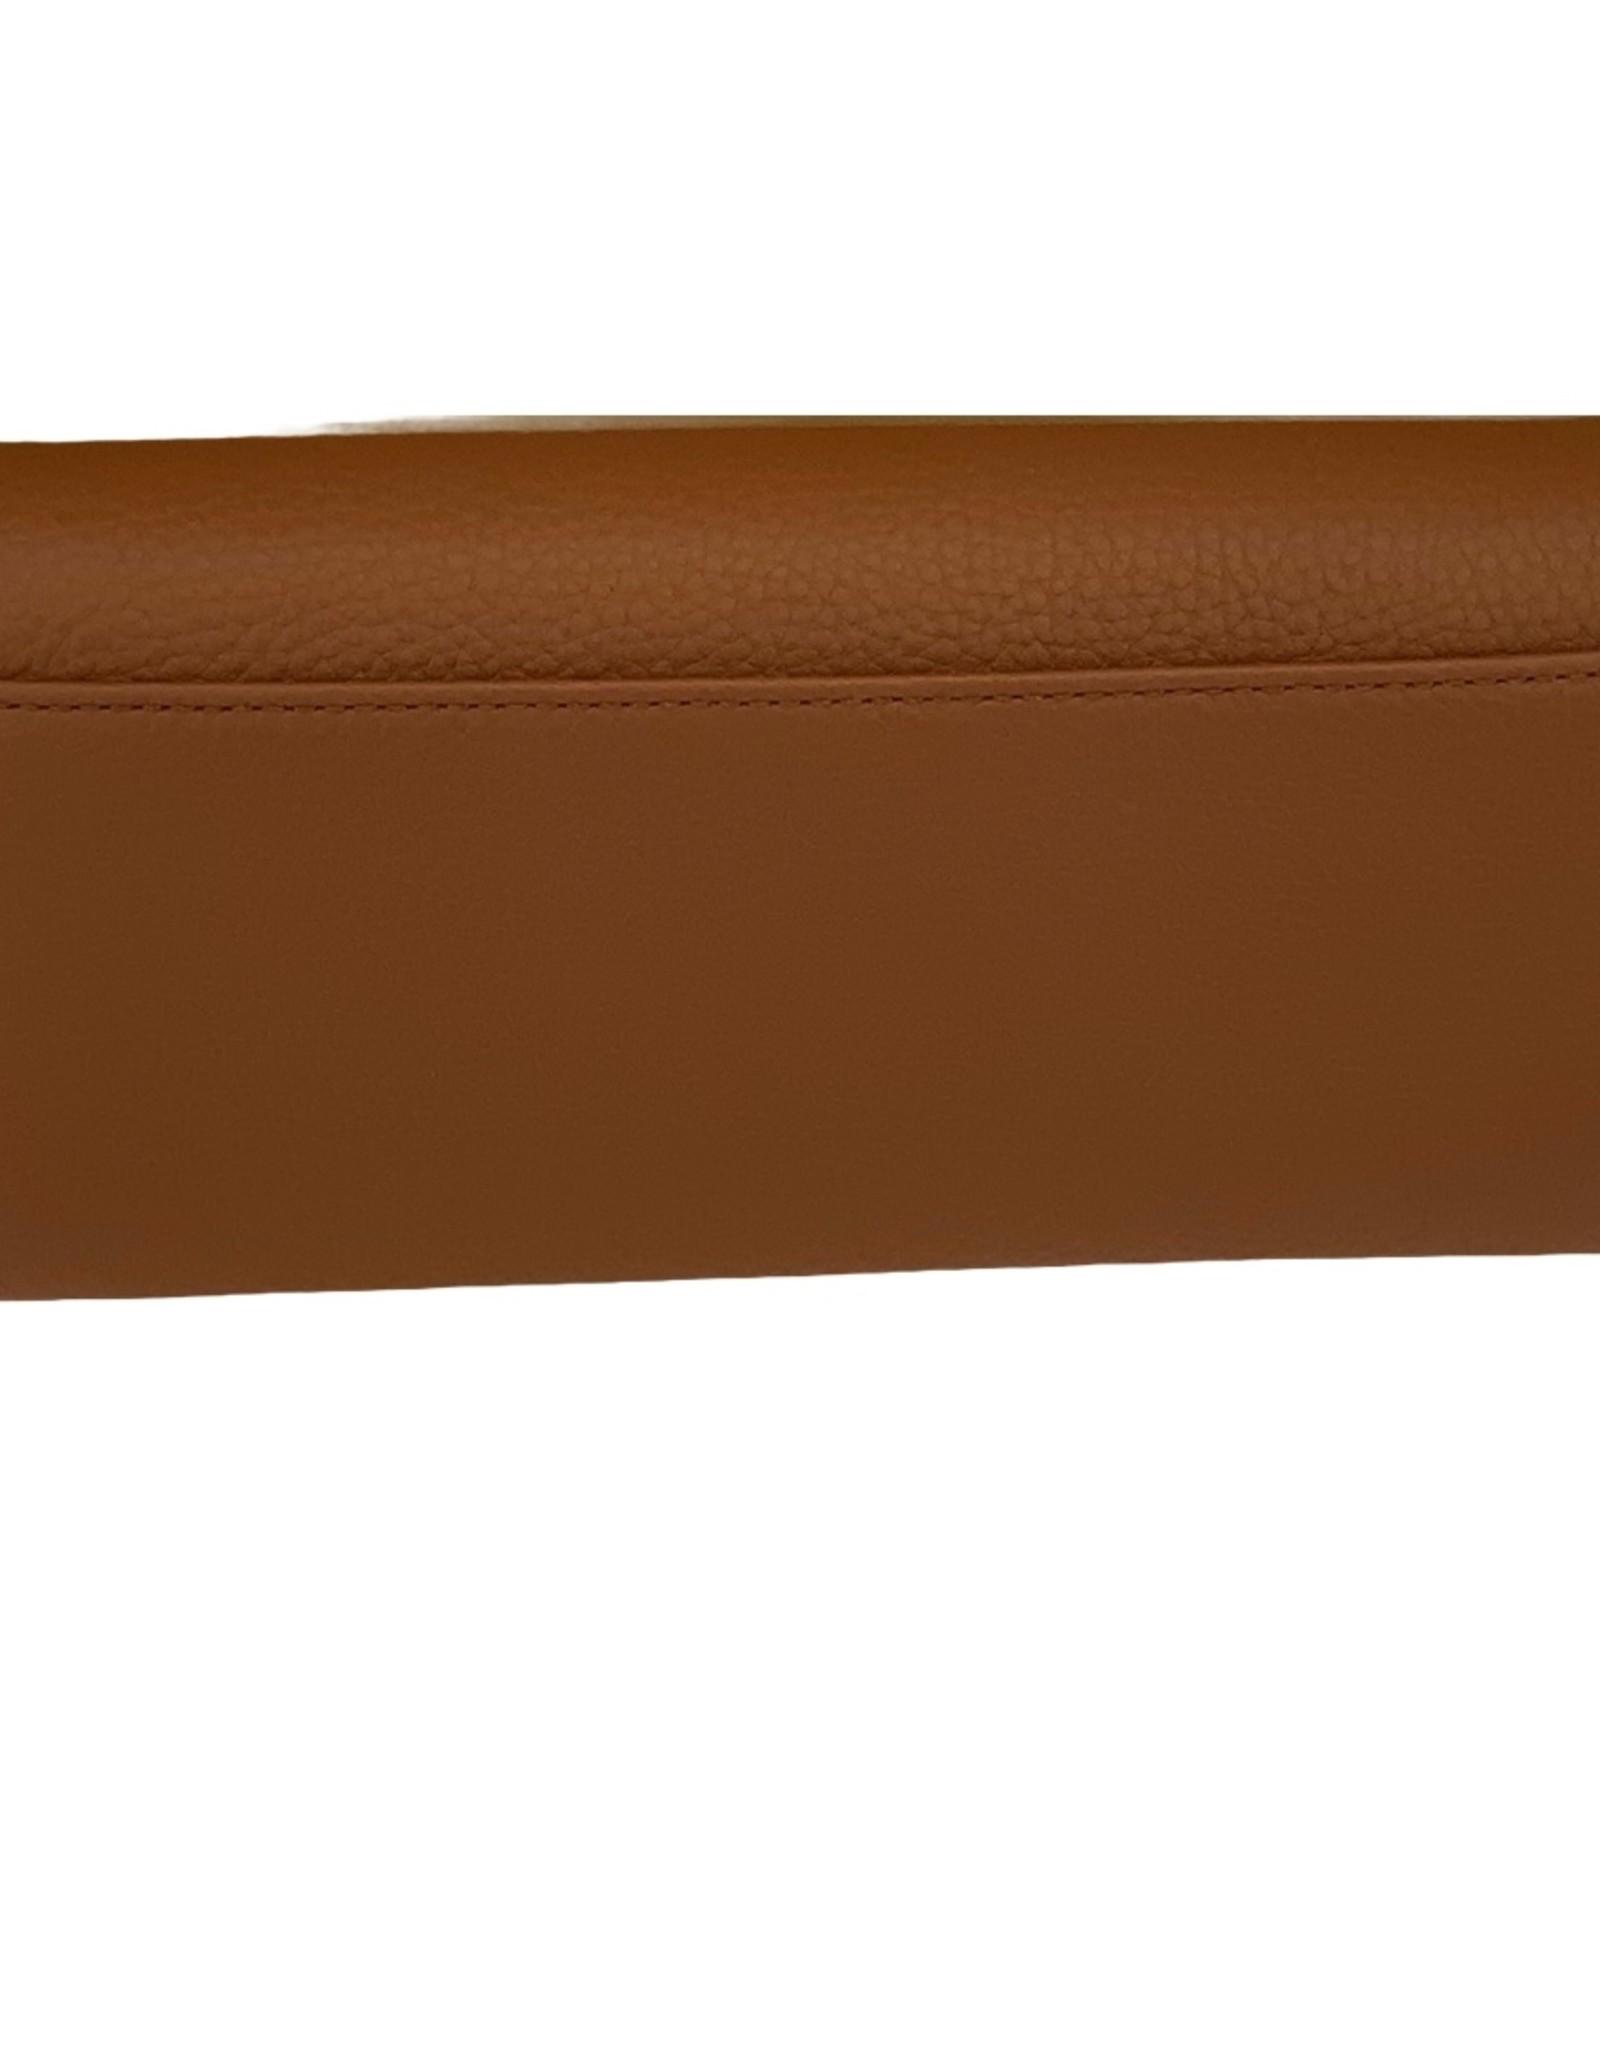 Michael Kors Michael Kors Wallet Flap Continental